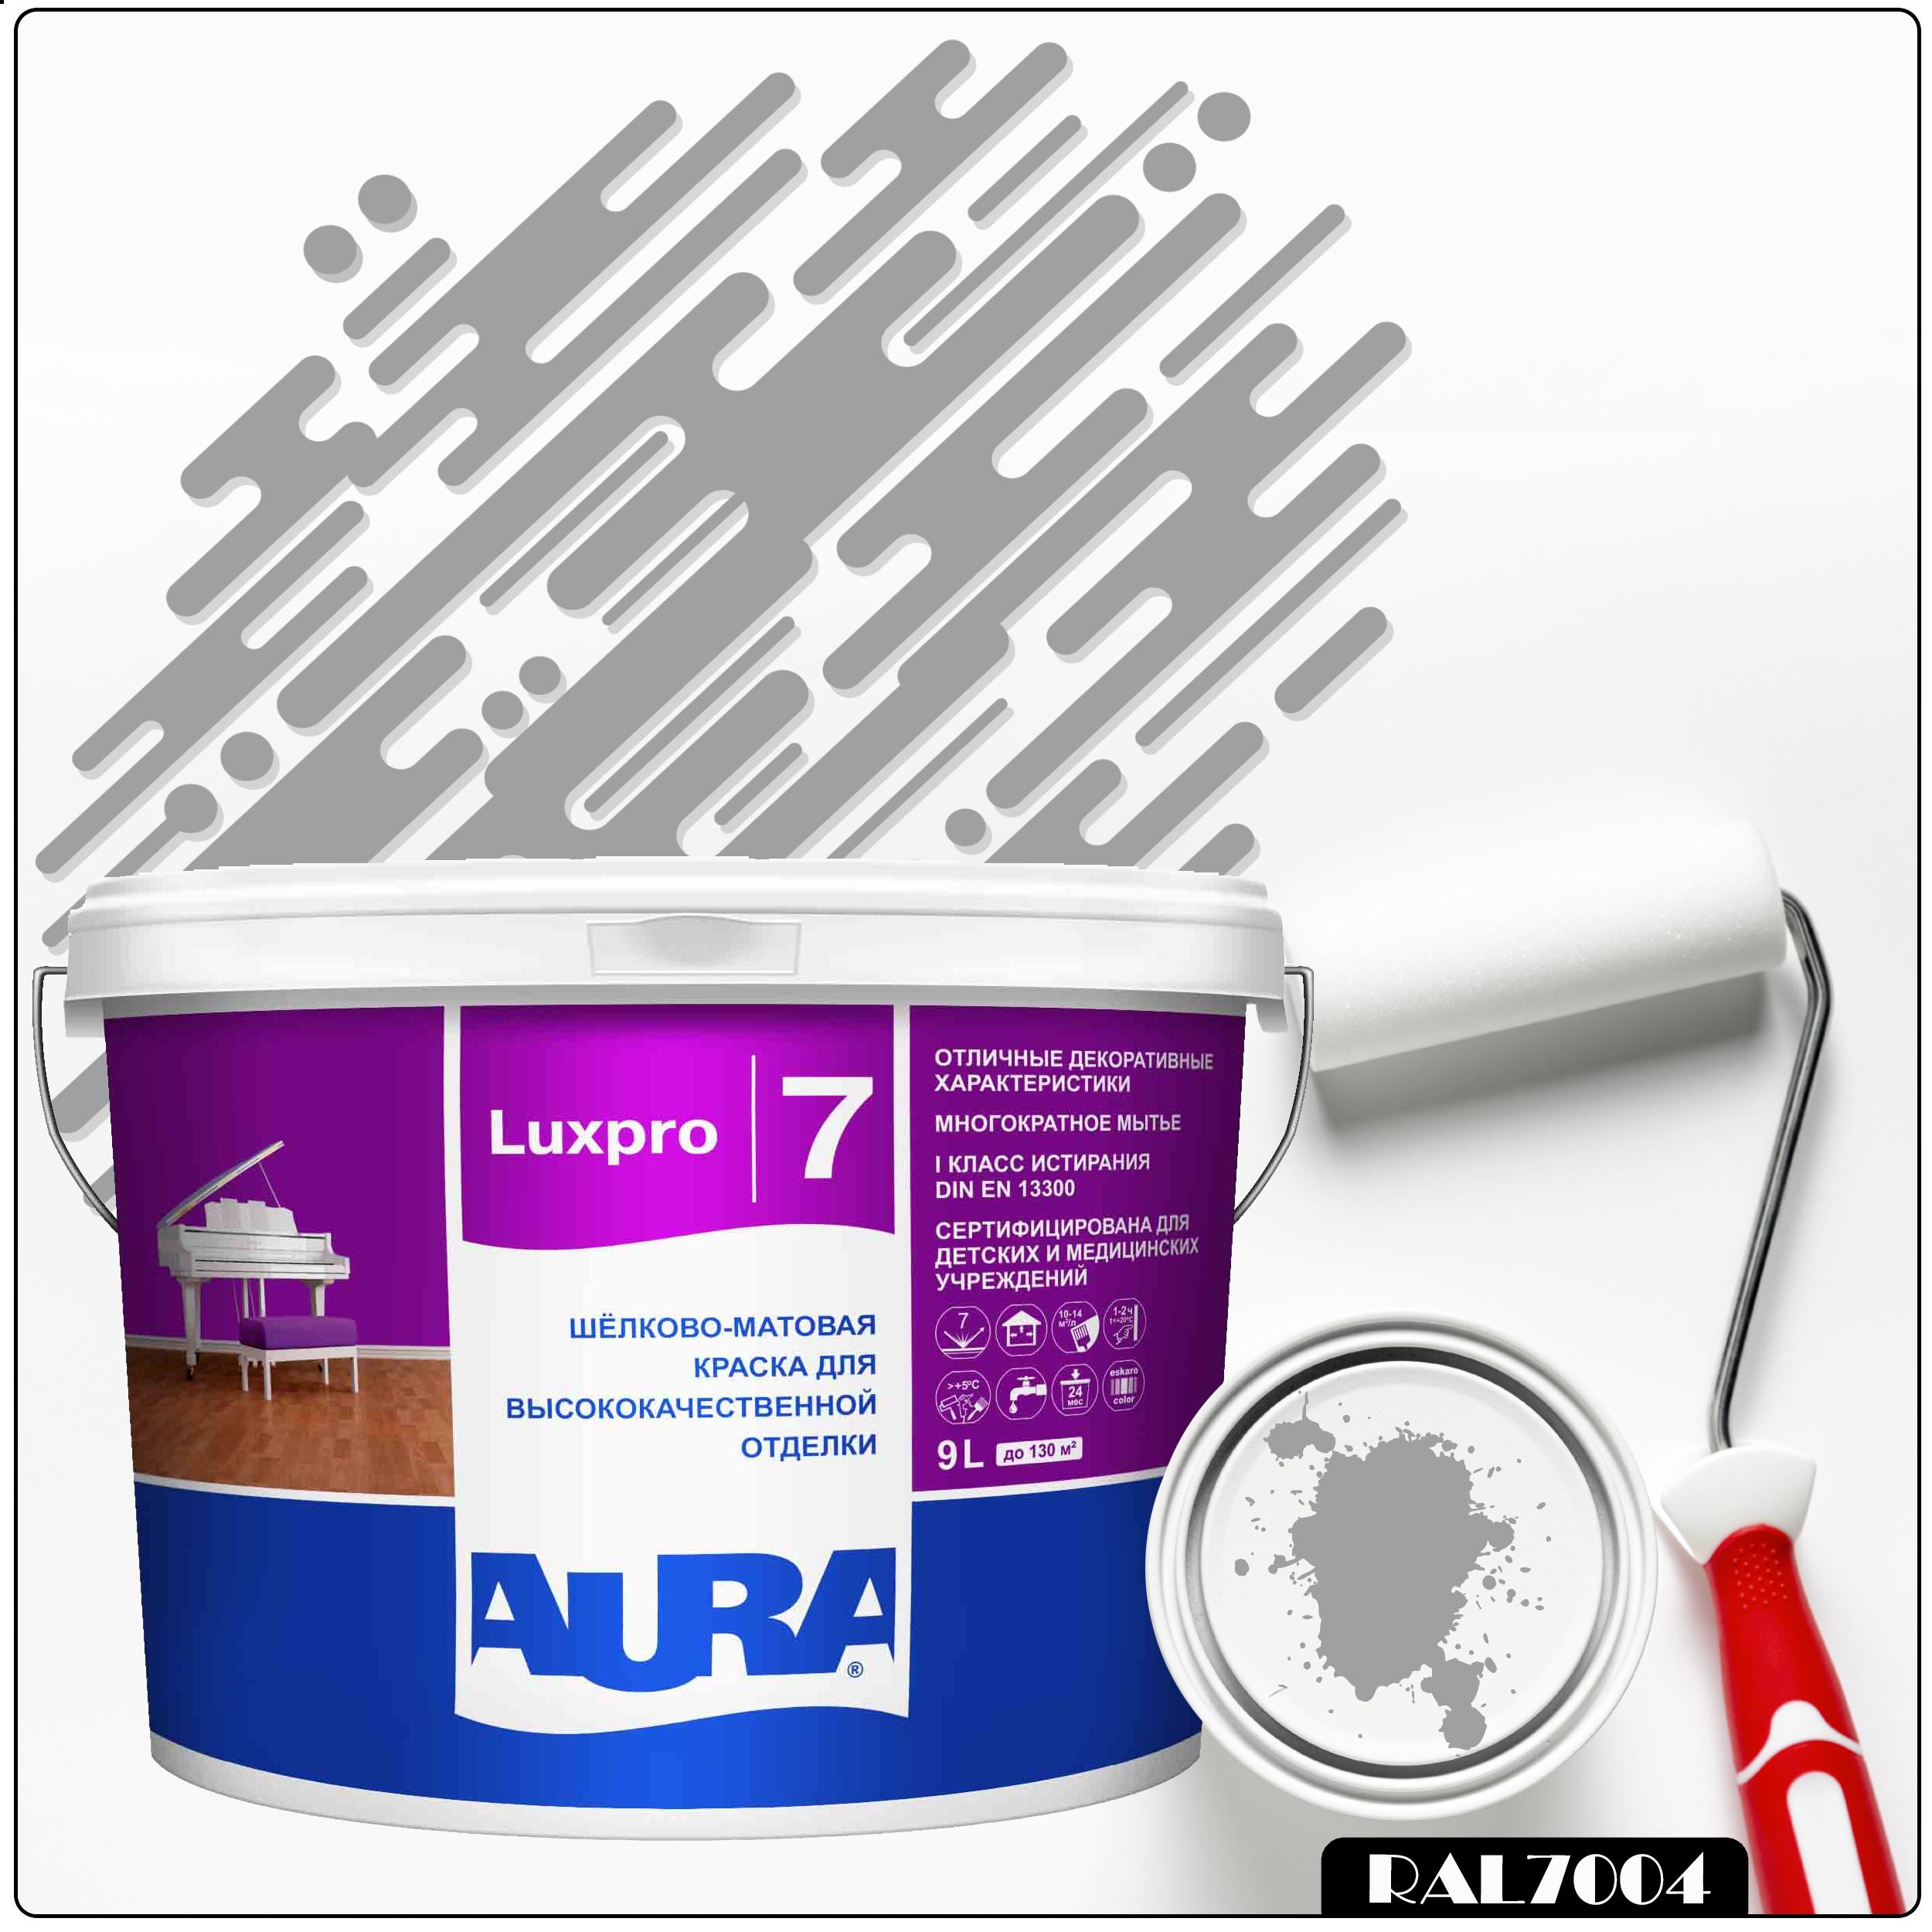 Фото 5 - Краска Aura LuxPRO 7, RAL 7004 Серый сигнальный, латексная, шелково-матовая, интерьерная, 9л, Аура.